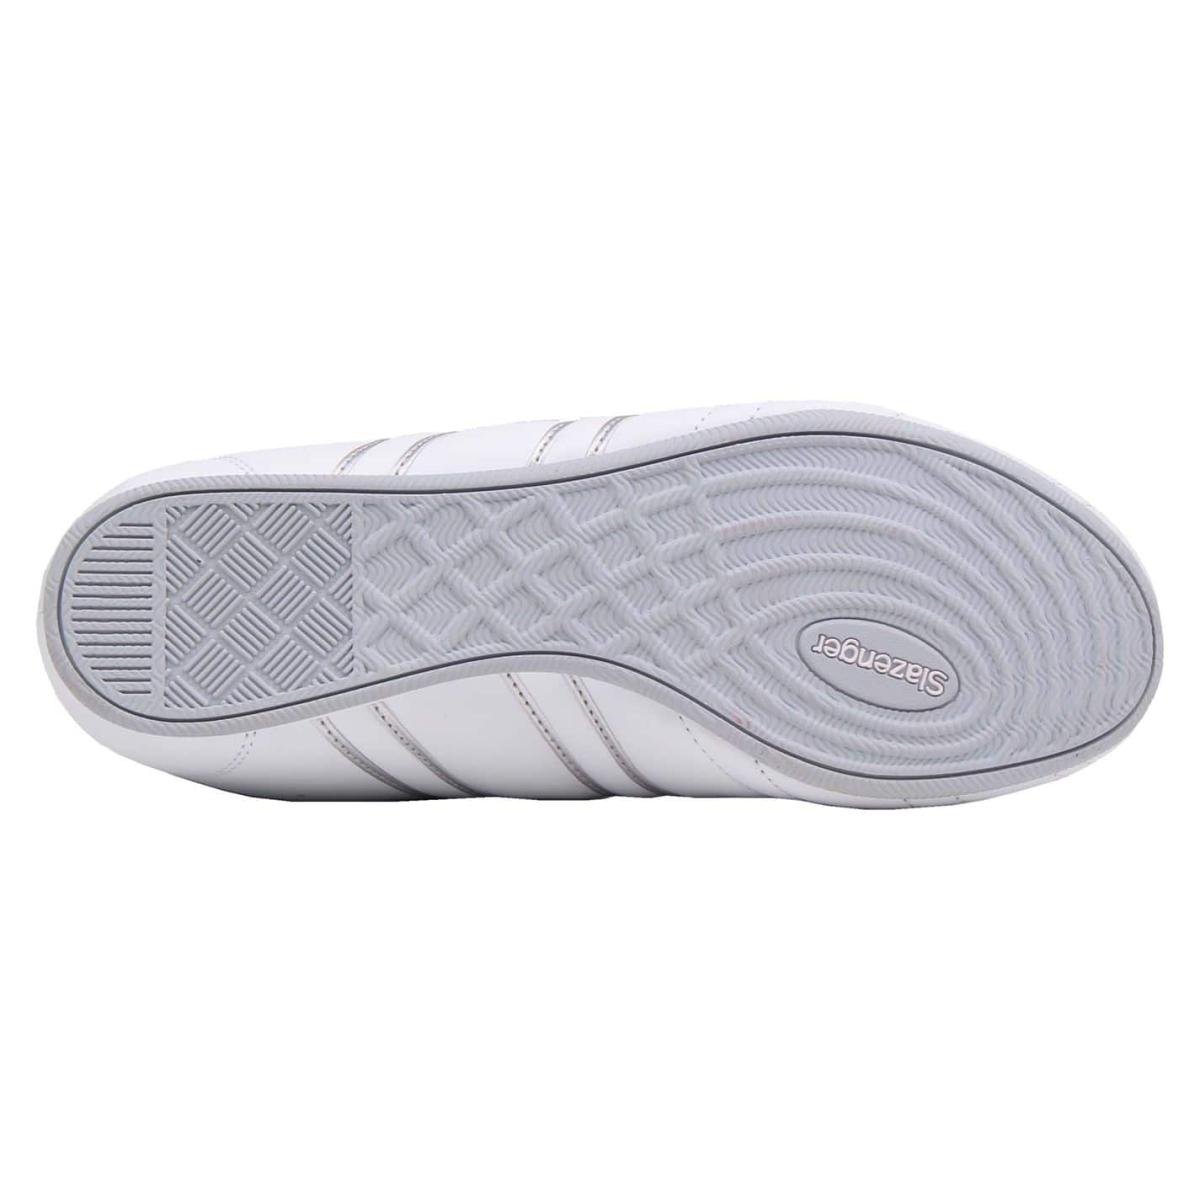 Slazenger-Turnschuhe-Damen-Sneaker-Sportschuhe-Laufschuhe-Warrior-5087 Indexbild 9